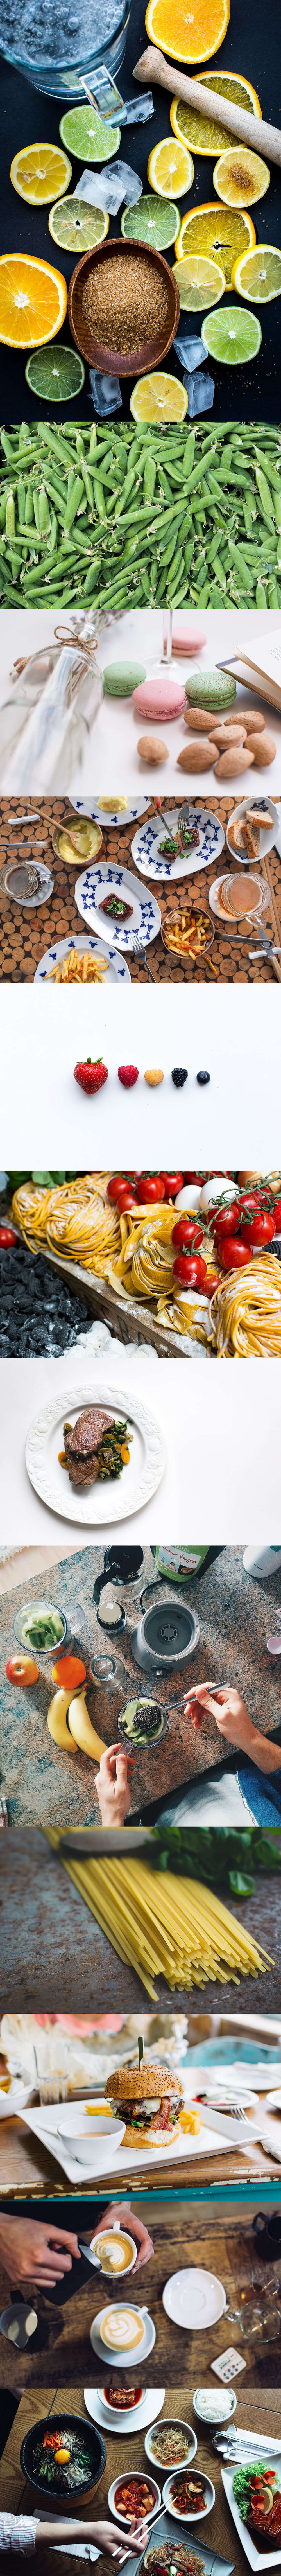 Free Food Photos